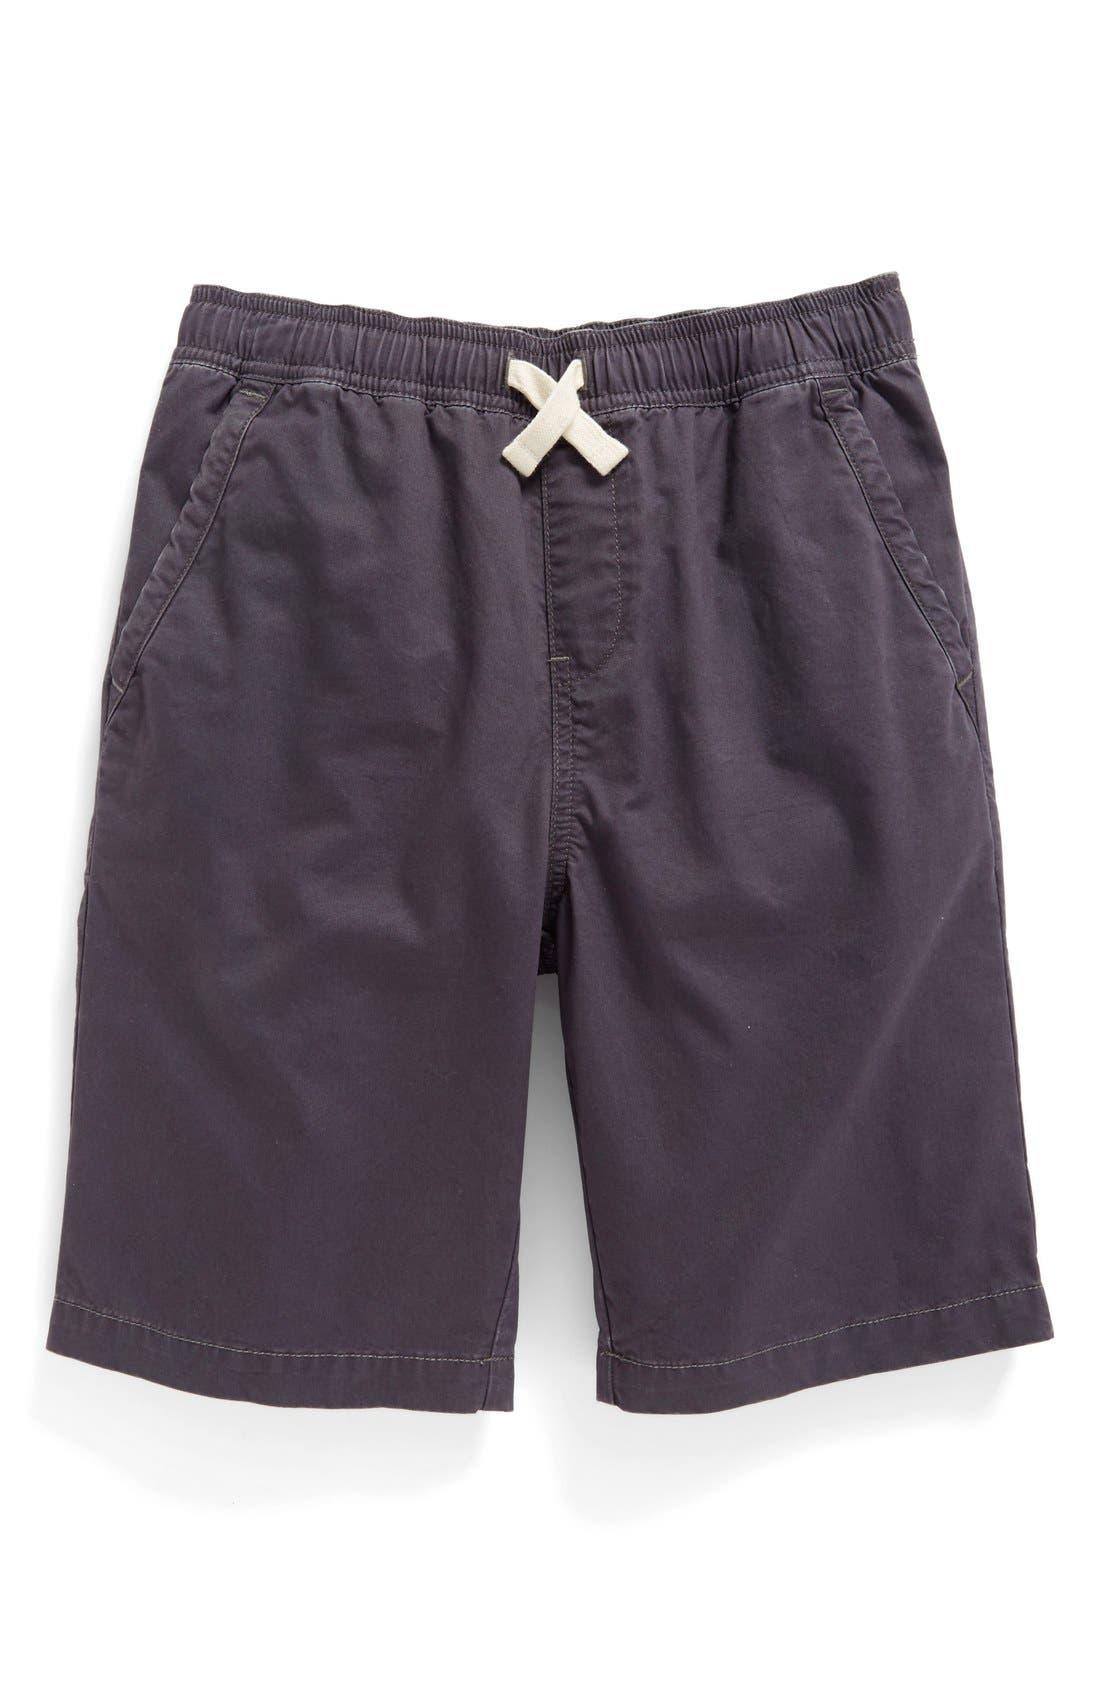 Alternate Image 1 Selected - Tucker + Tate Cotton Twill Shorts (Toddler Boys, Little Boys & Big Boys)